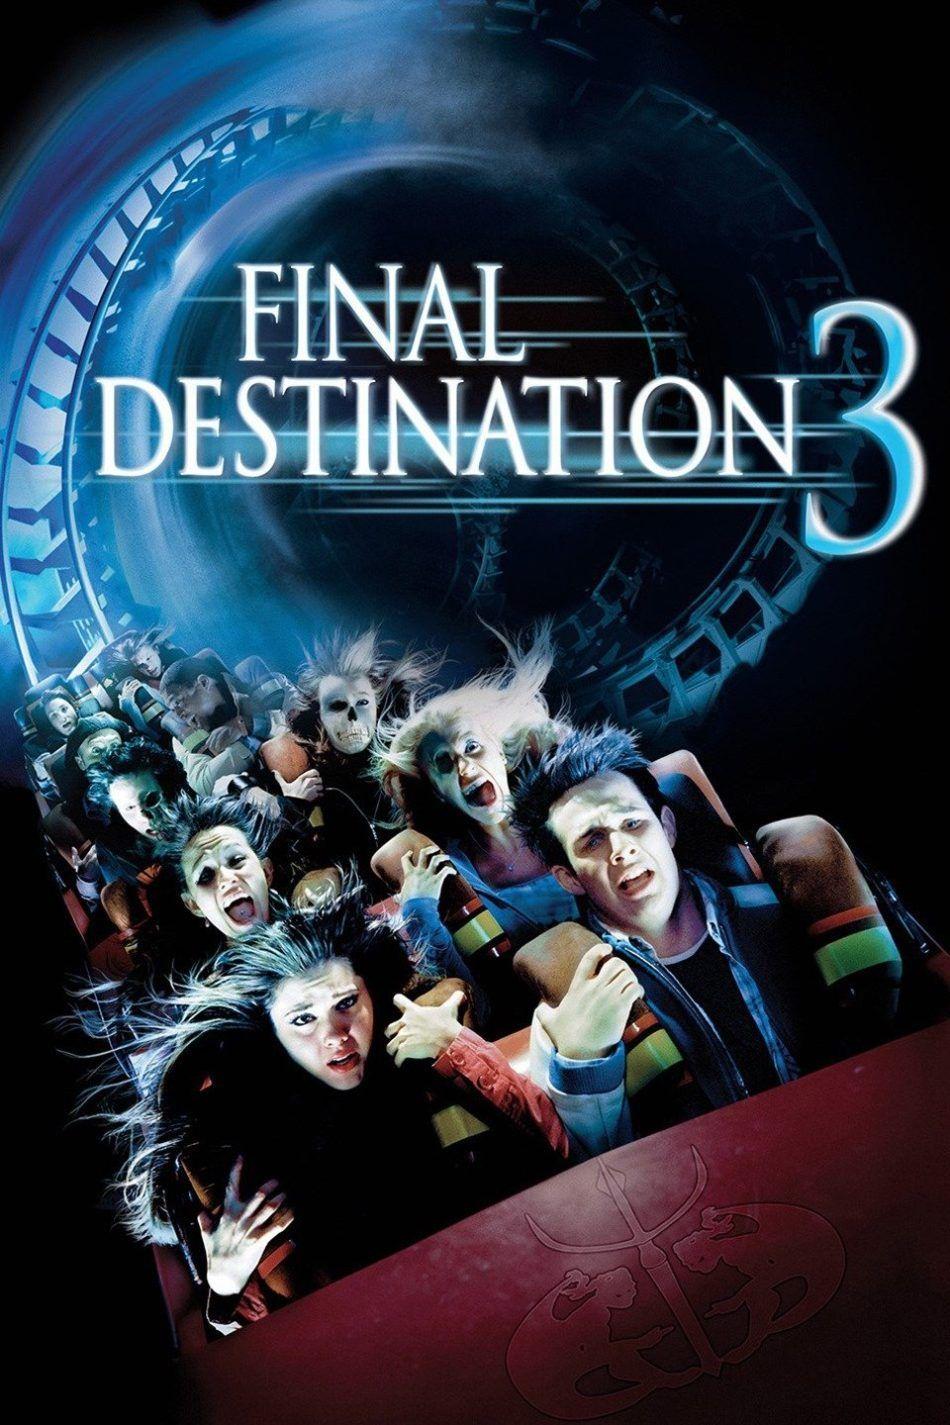 Download Final Destination 3 2006 Dual Audio English Hindi 720p Destino Final 3 Poster De Peliculas Peliculas De Terror